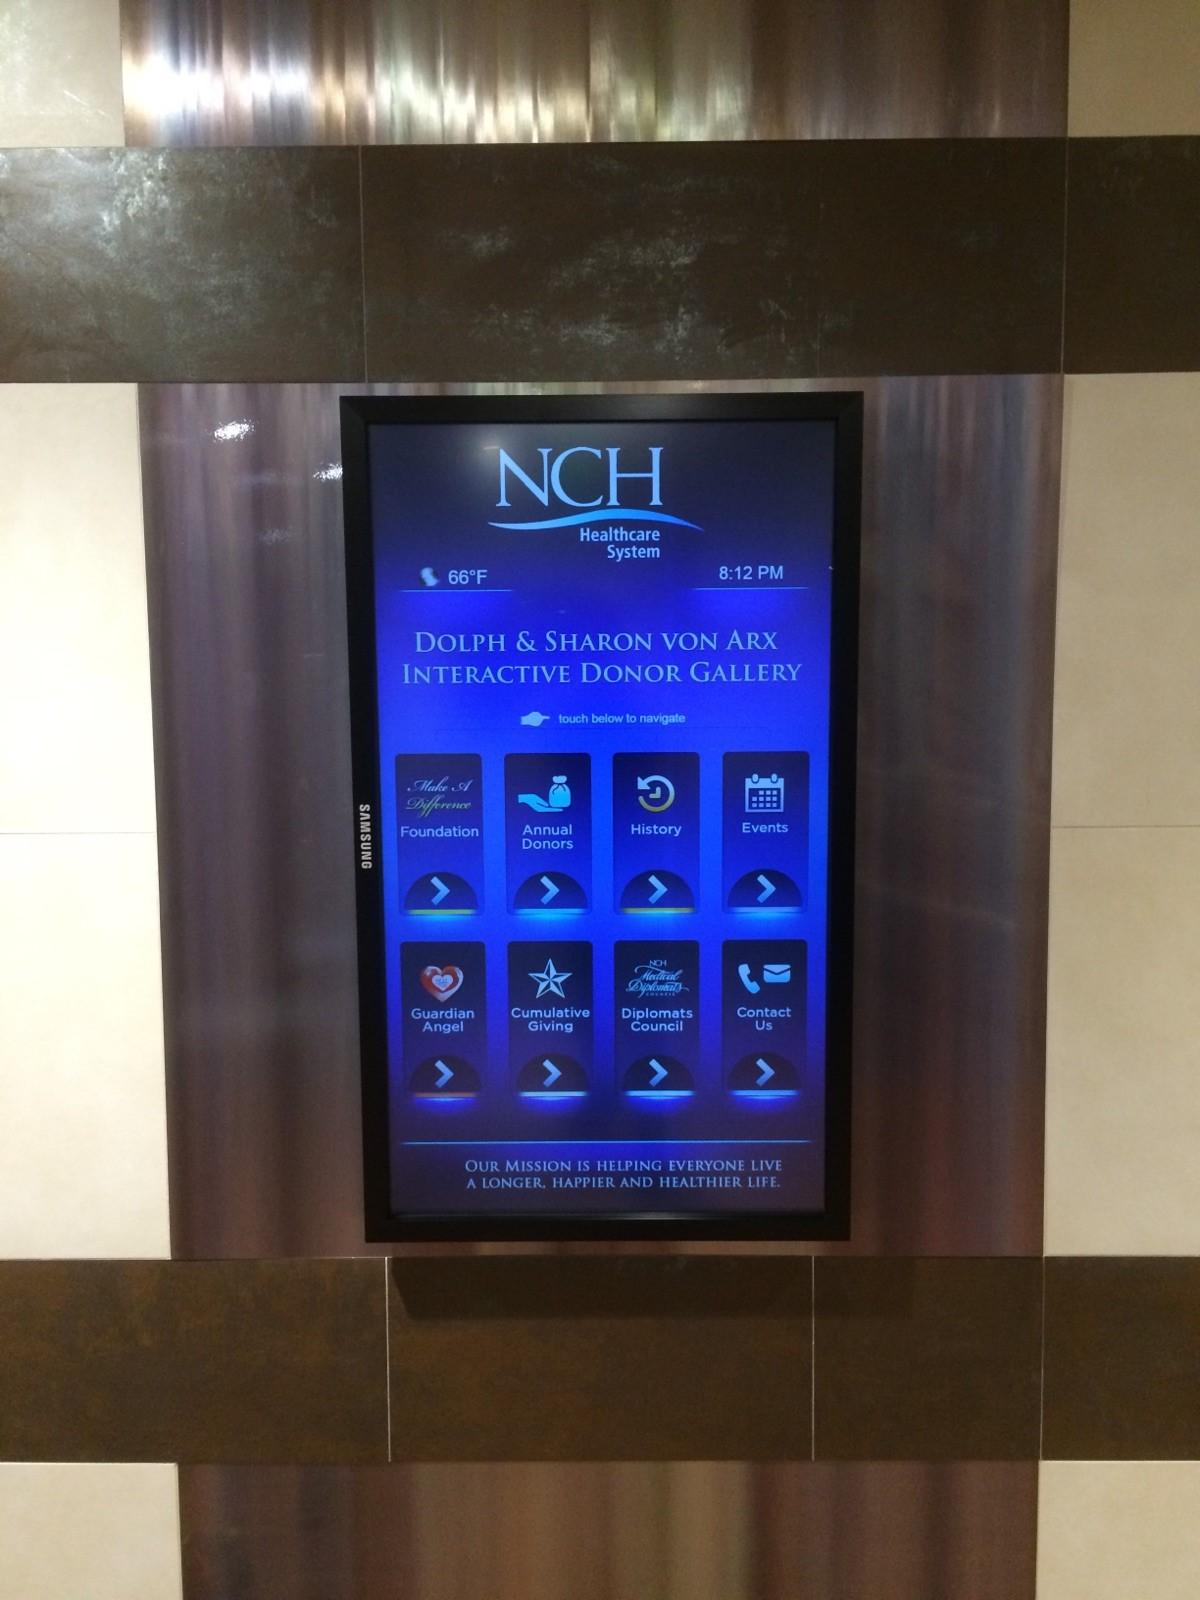 NCH-Healthcare-Northeast-Naples.jpg